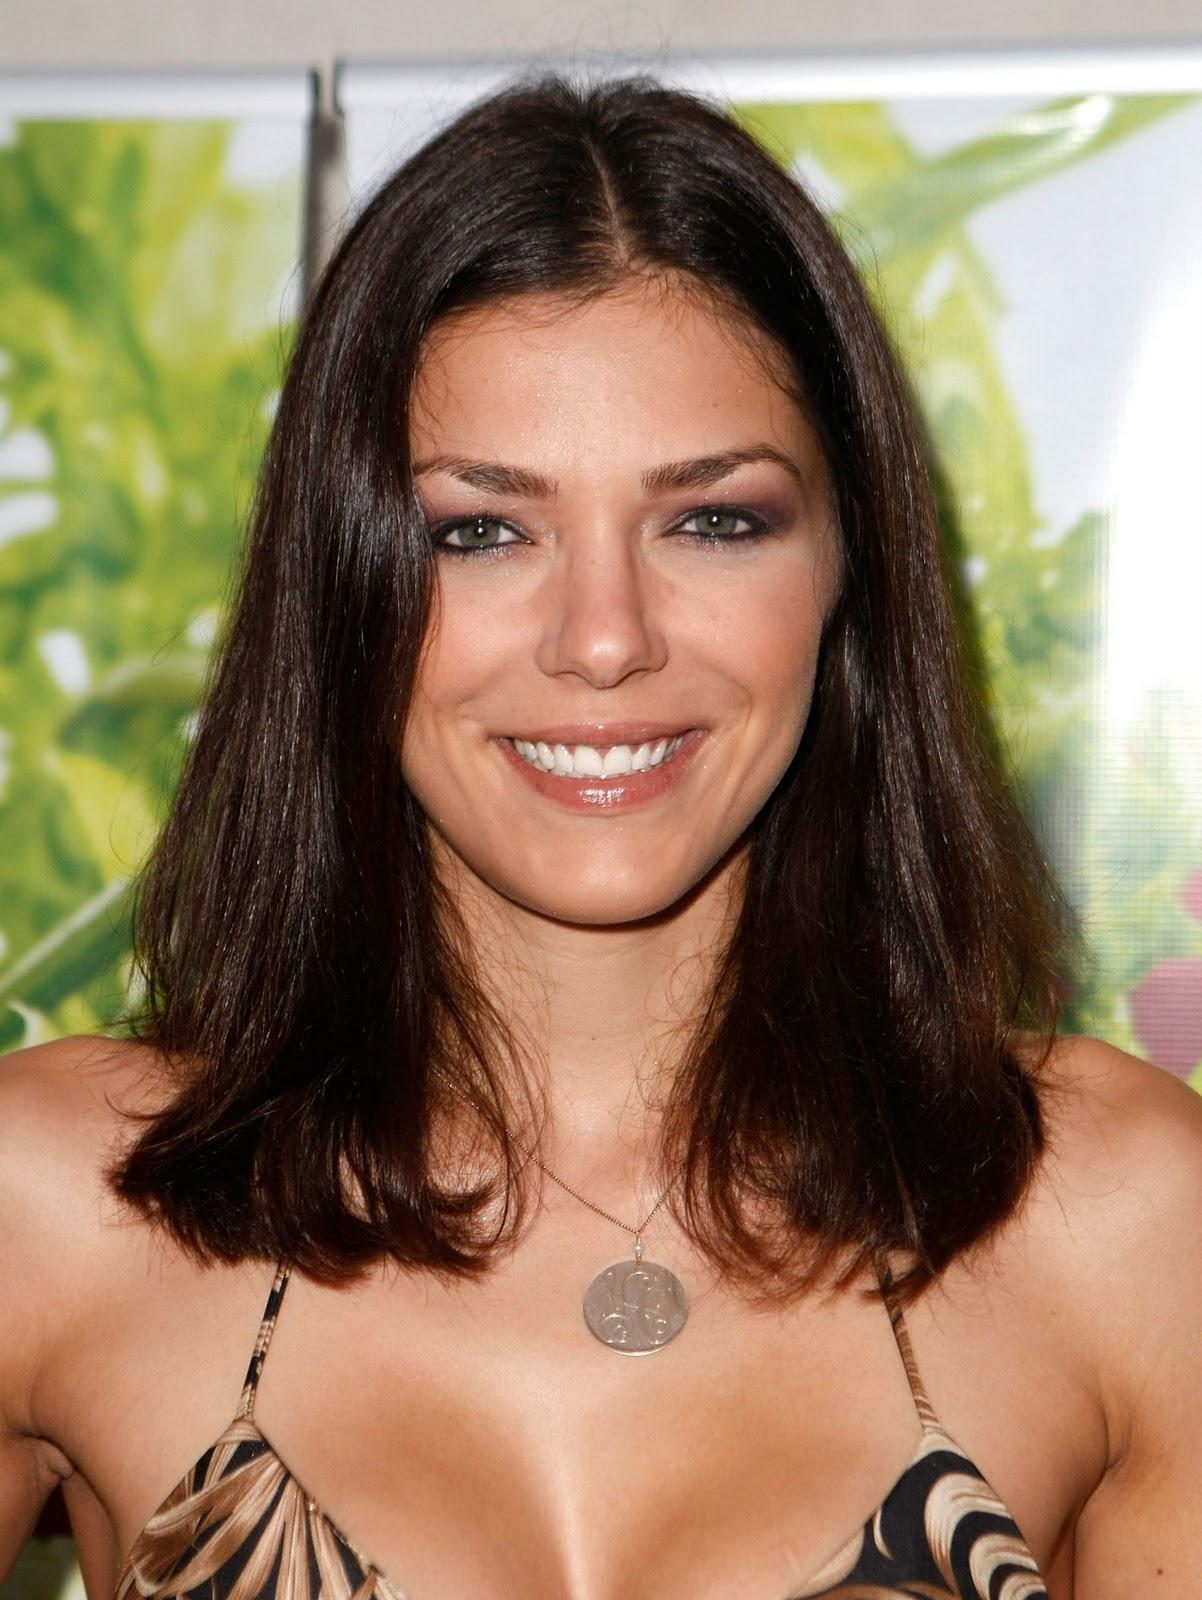 http://2.bp.blogspot.com/-YubS-Jw3dD0/Tst50JarVKI/AAAAAAAAGxI/8d5Ahxs6nlw/s1600/Adrianne-Curry+hairstyles+%25281%2529.jpg